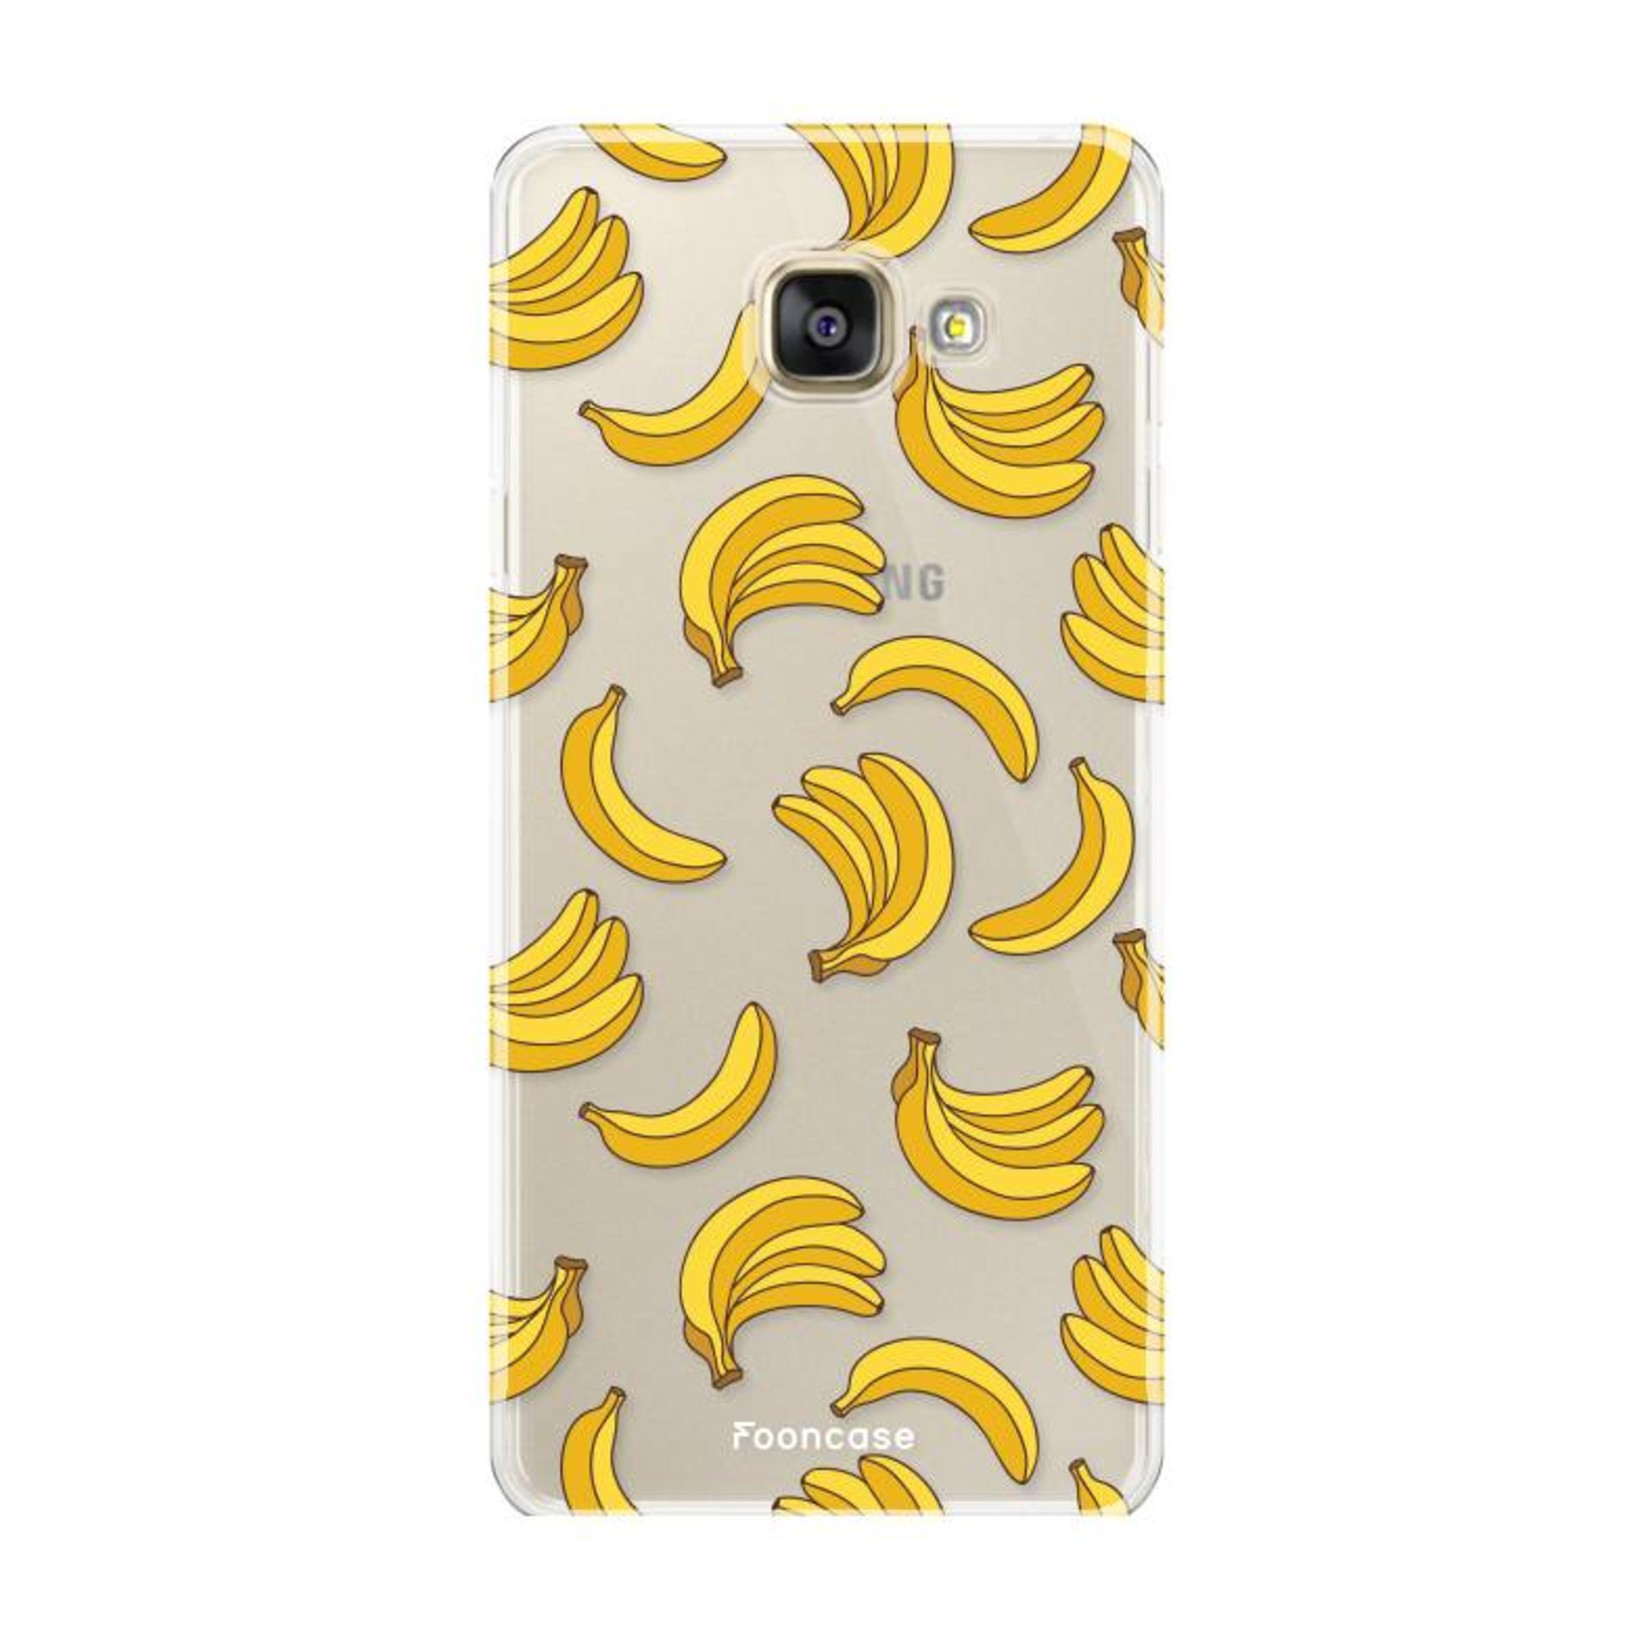 FOONCASE Samsung Galaxy A5 2016 hoesje TPU Soft Case - Back Cover - Bananas / Banaan / Bananen